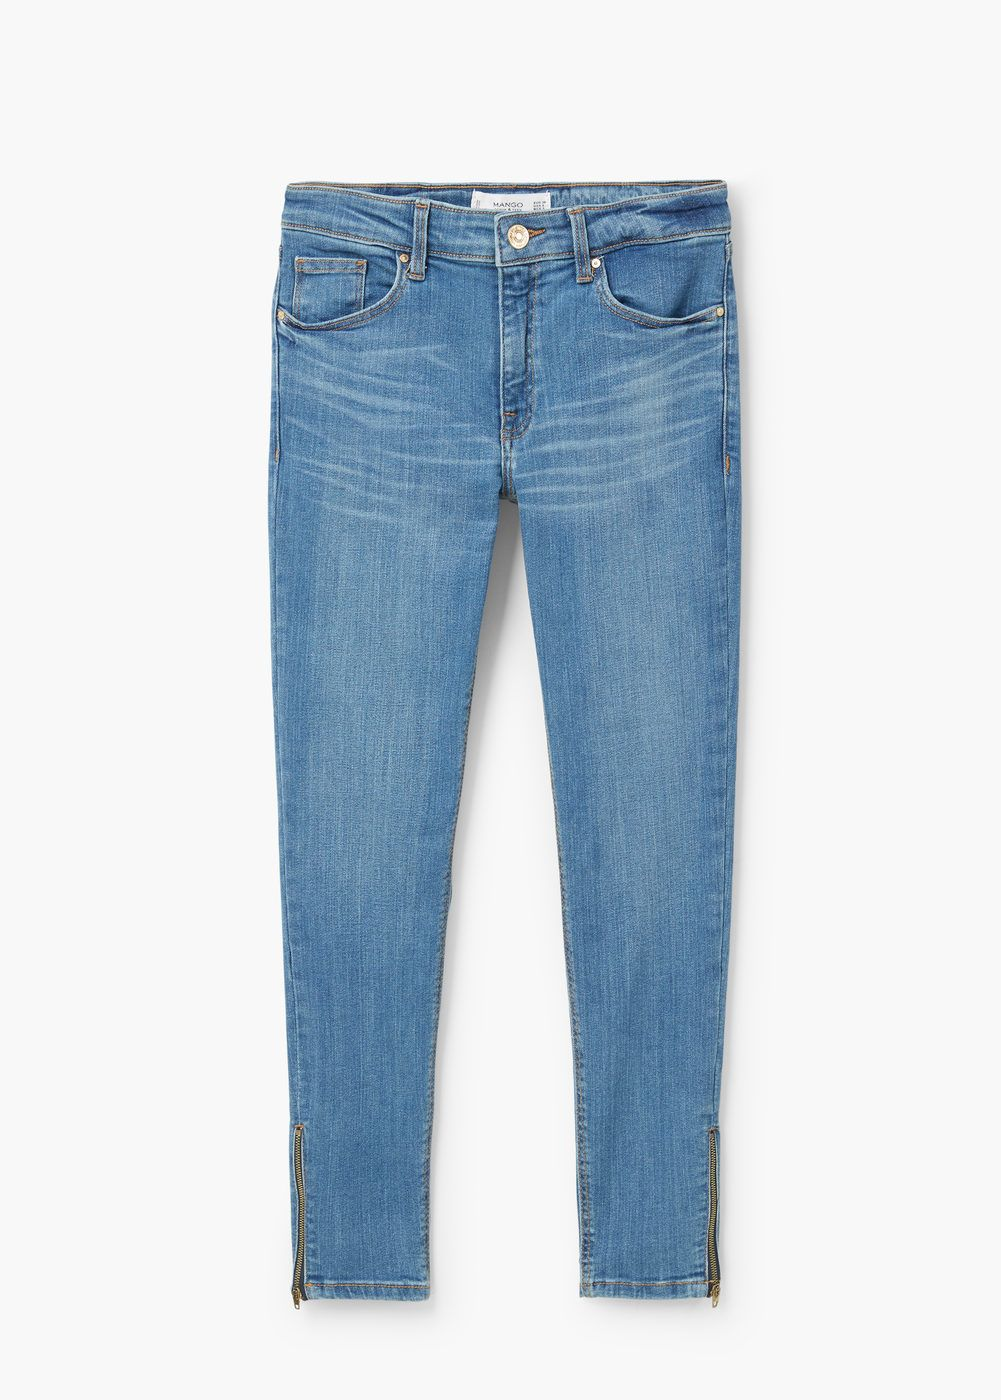 70c915db4c9 Skinny crop tattoo jeans - Woman   JEANS LEGGING SUMMER   Vaqueros ...